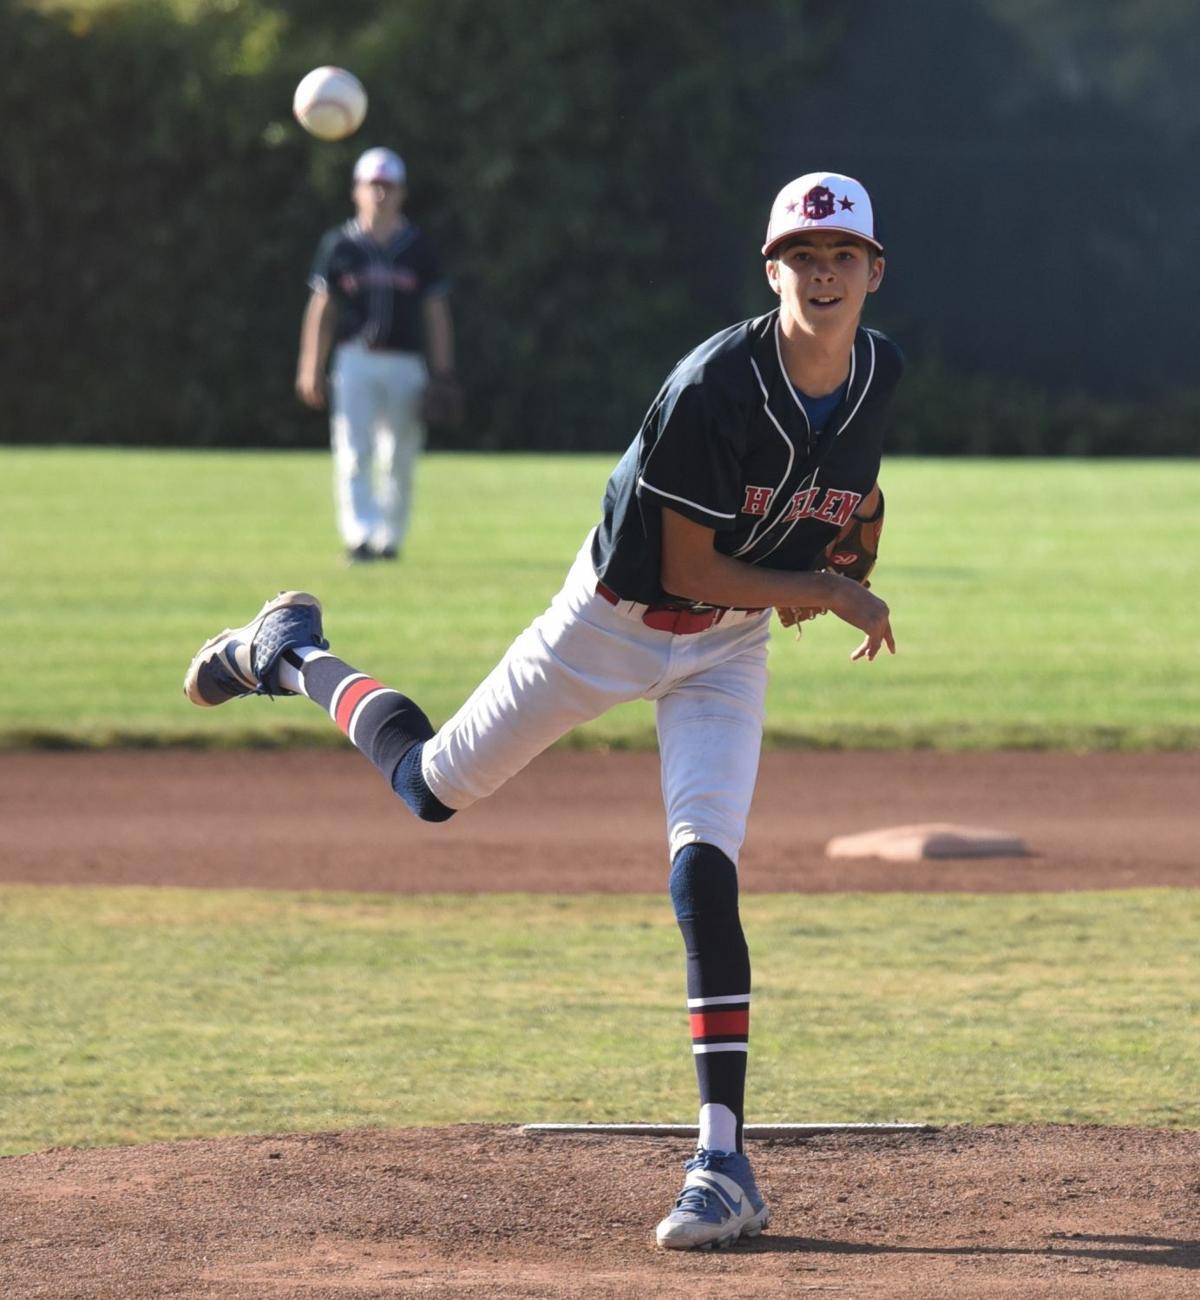 St. Helena starter Thomas Heil pitches